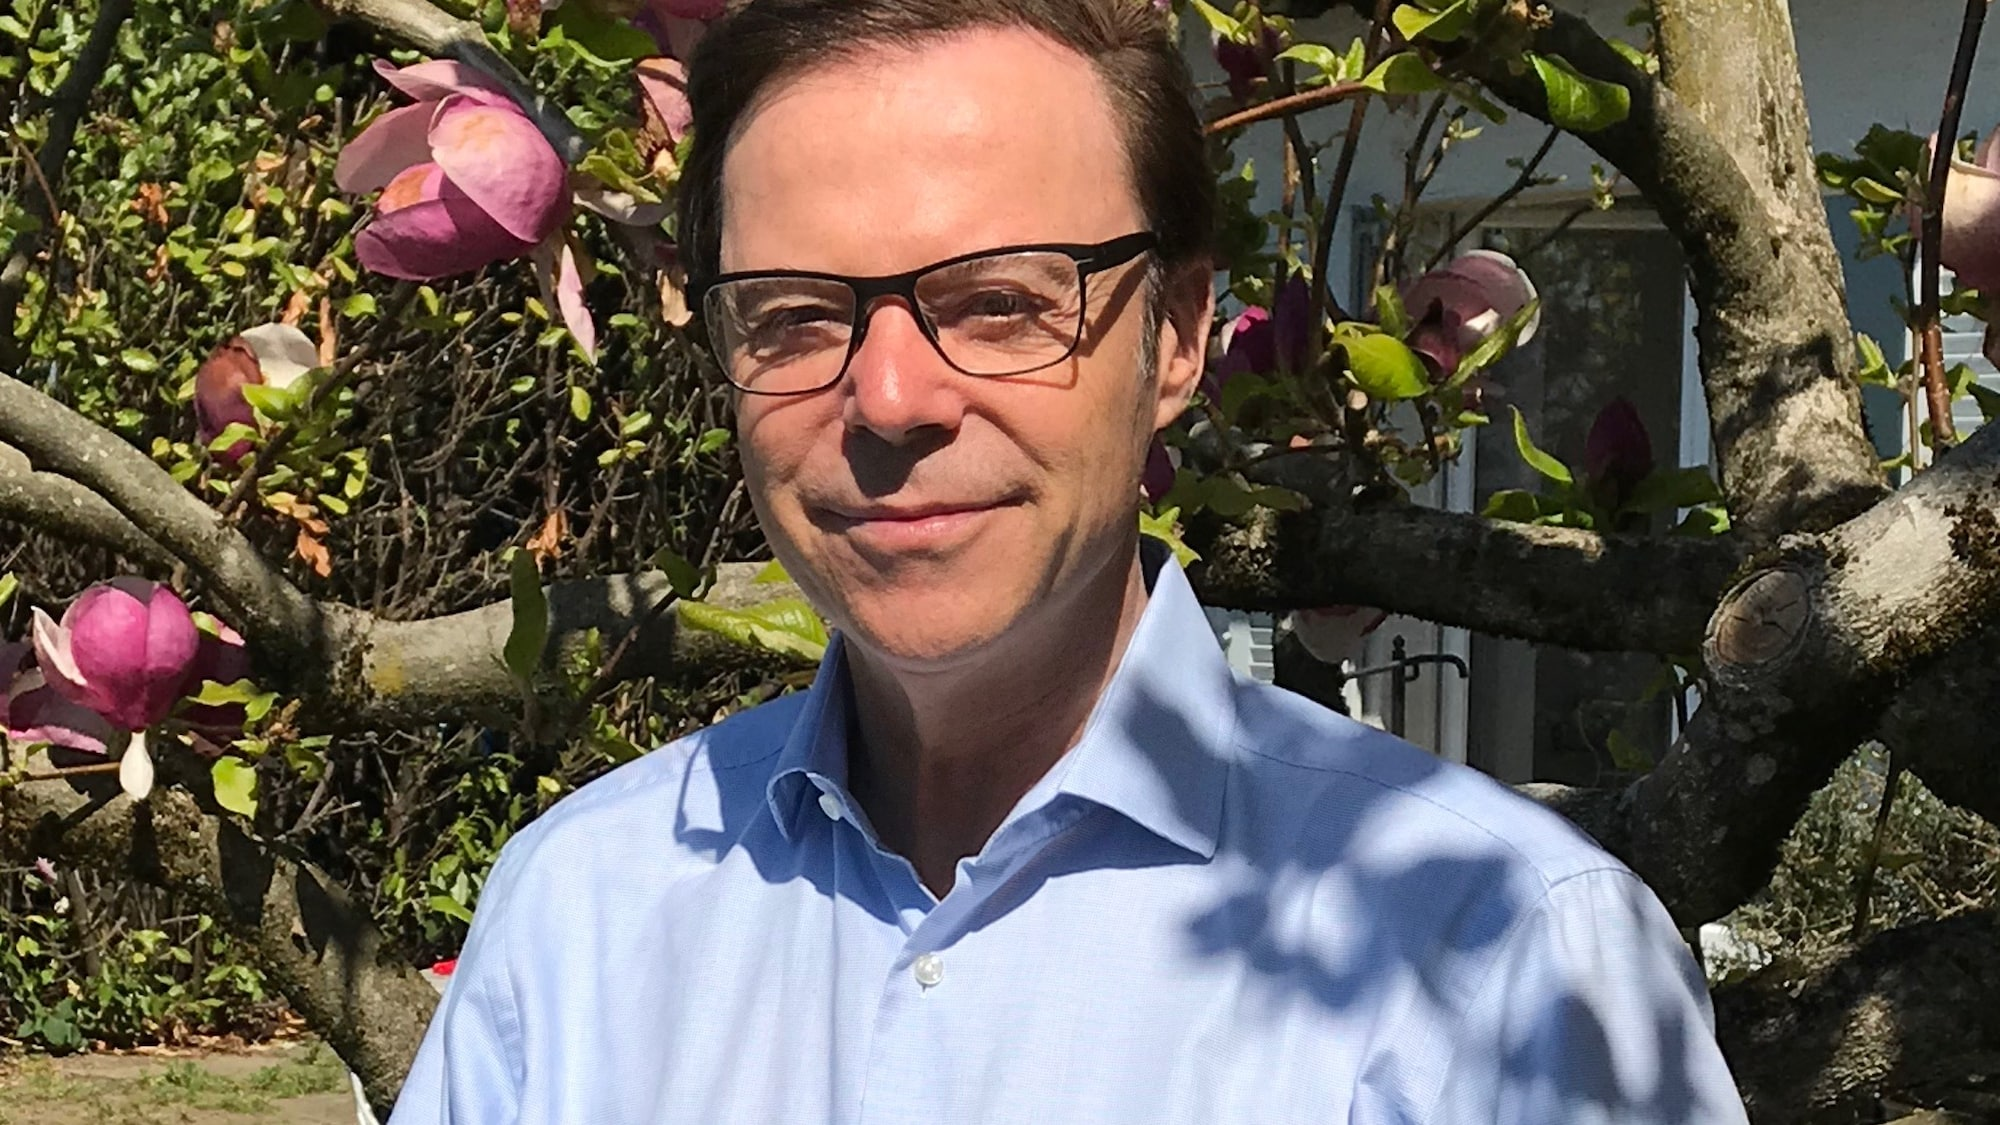 Comeback des SVP-Vordenkers: Christoph Mörgeli (58) will zurück in den Nationalrat